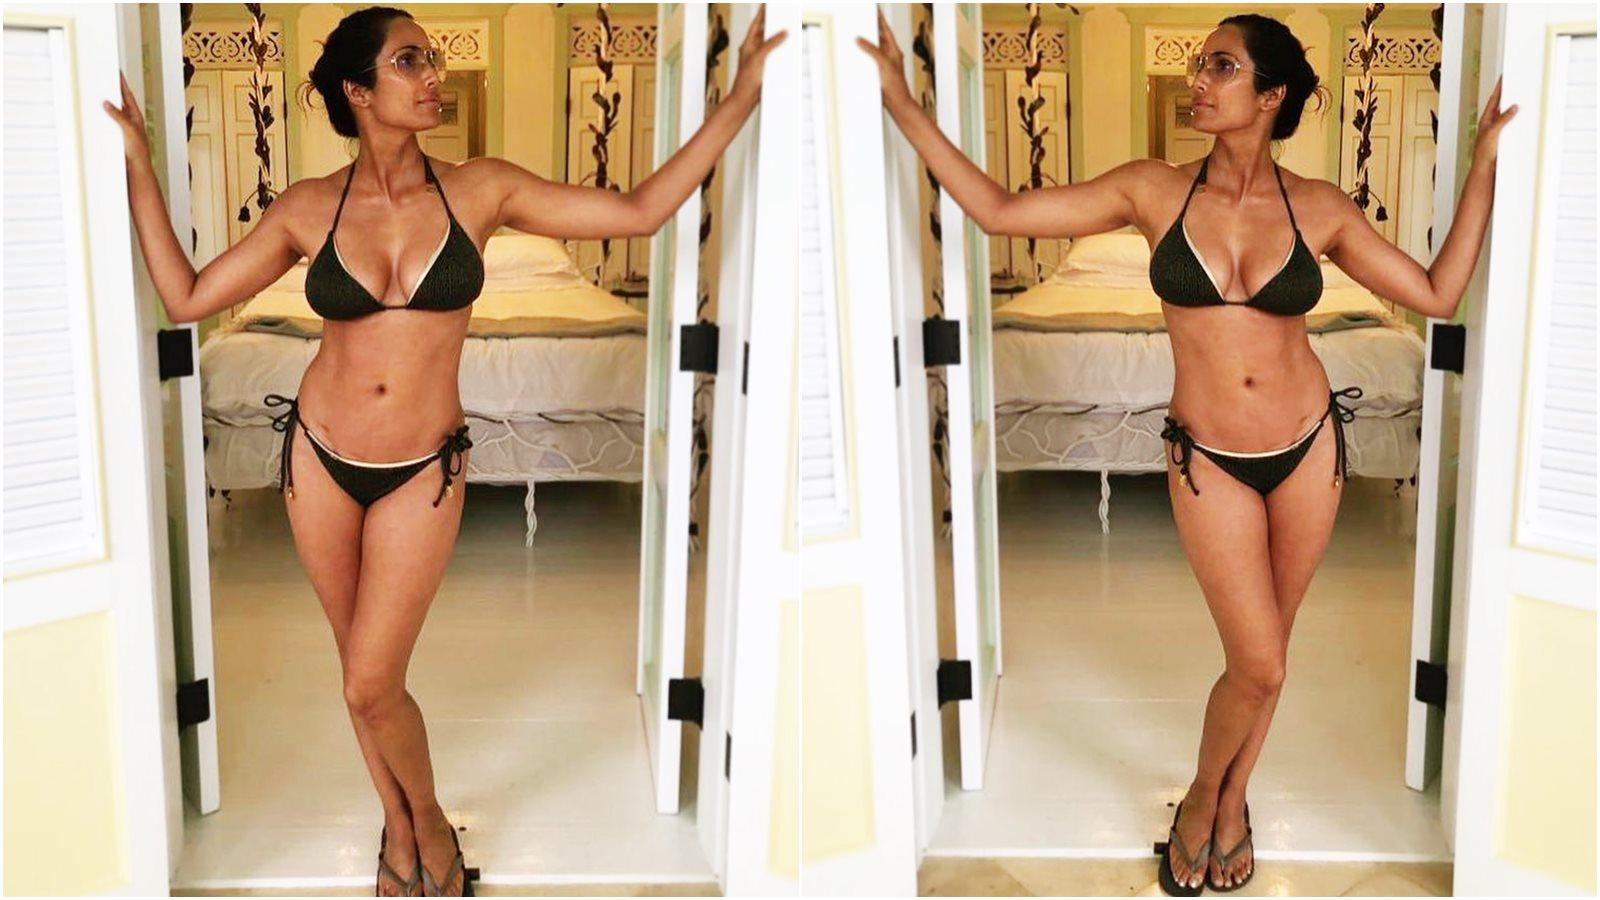 padma-lakshmi-is-feeling-fine-at-49-shares-sizzling-bikini-clad-picture